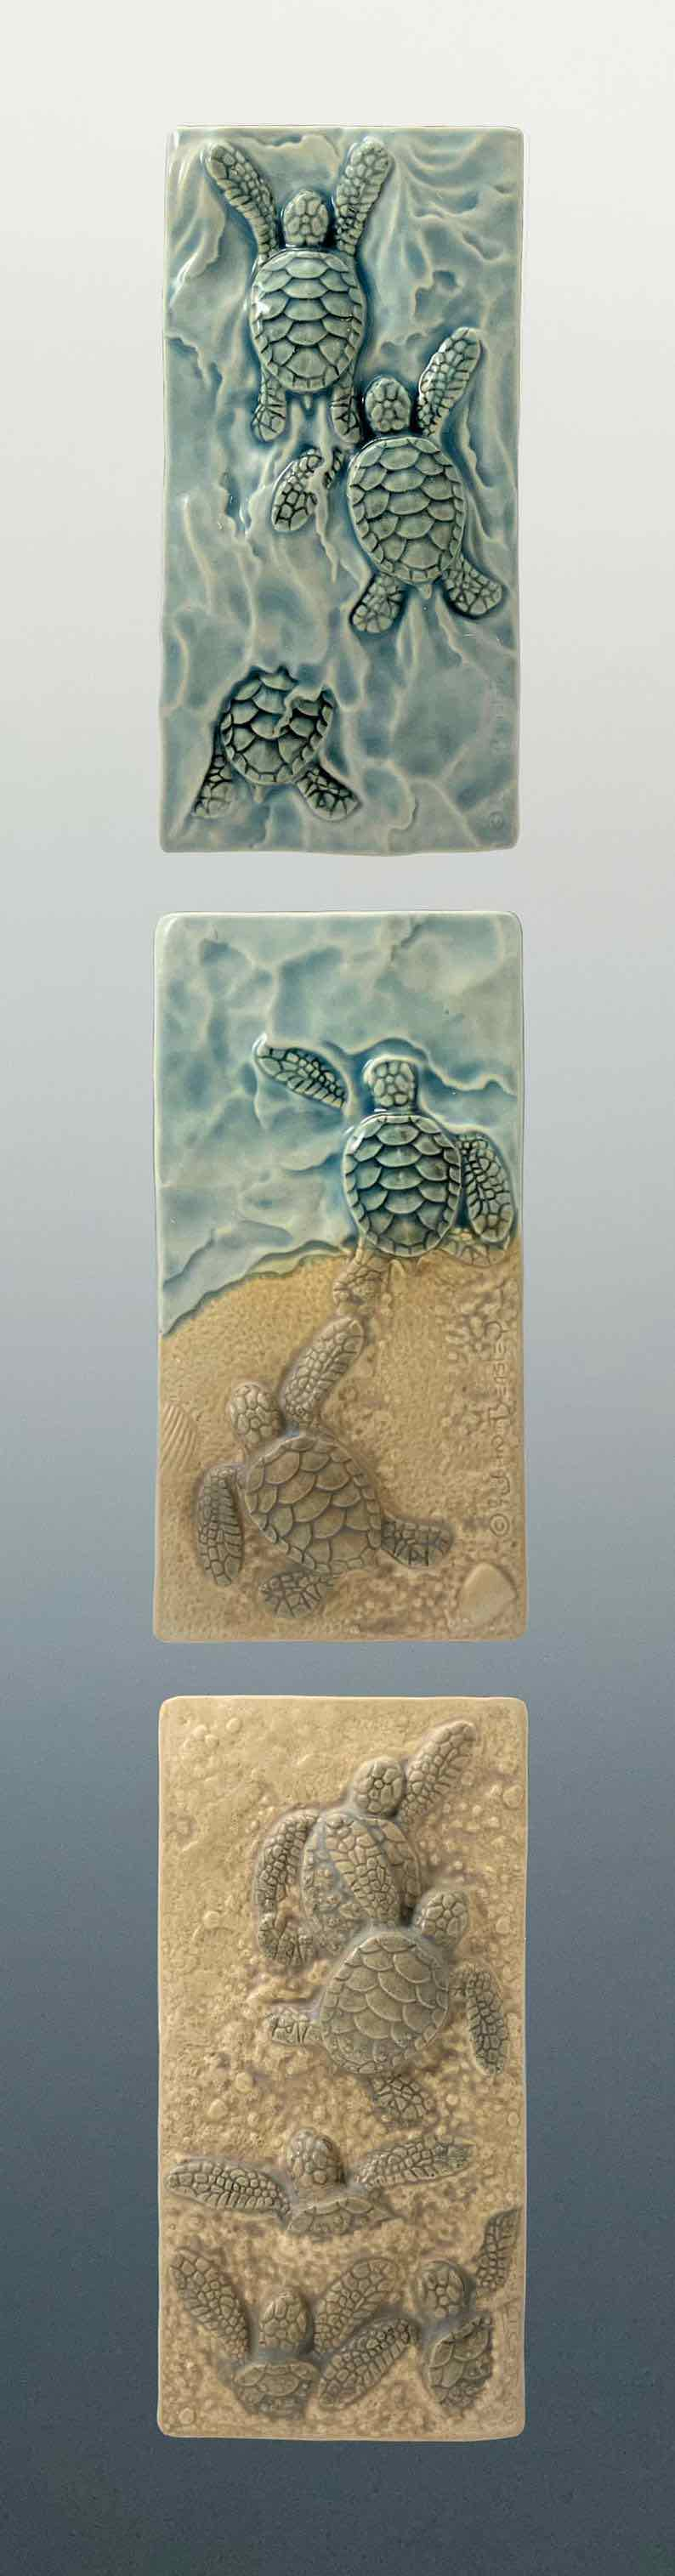 Baby Sea Turtle Ceramic Art Tiles